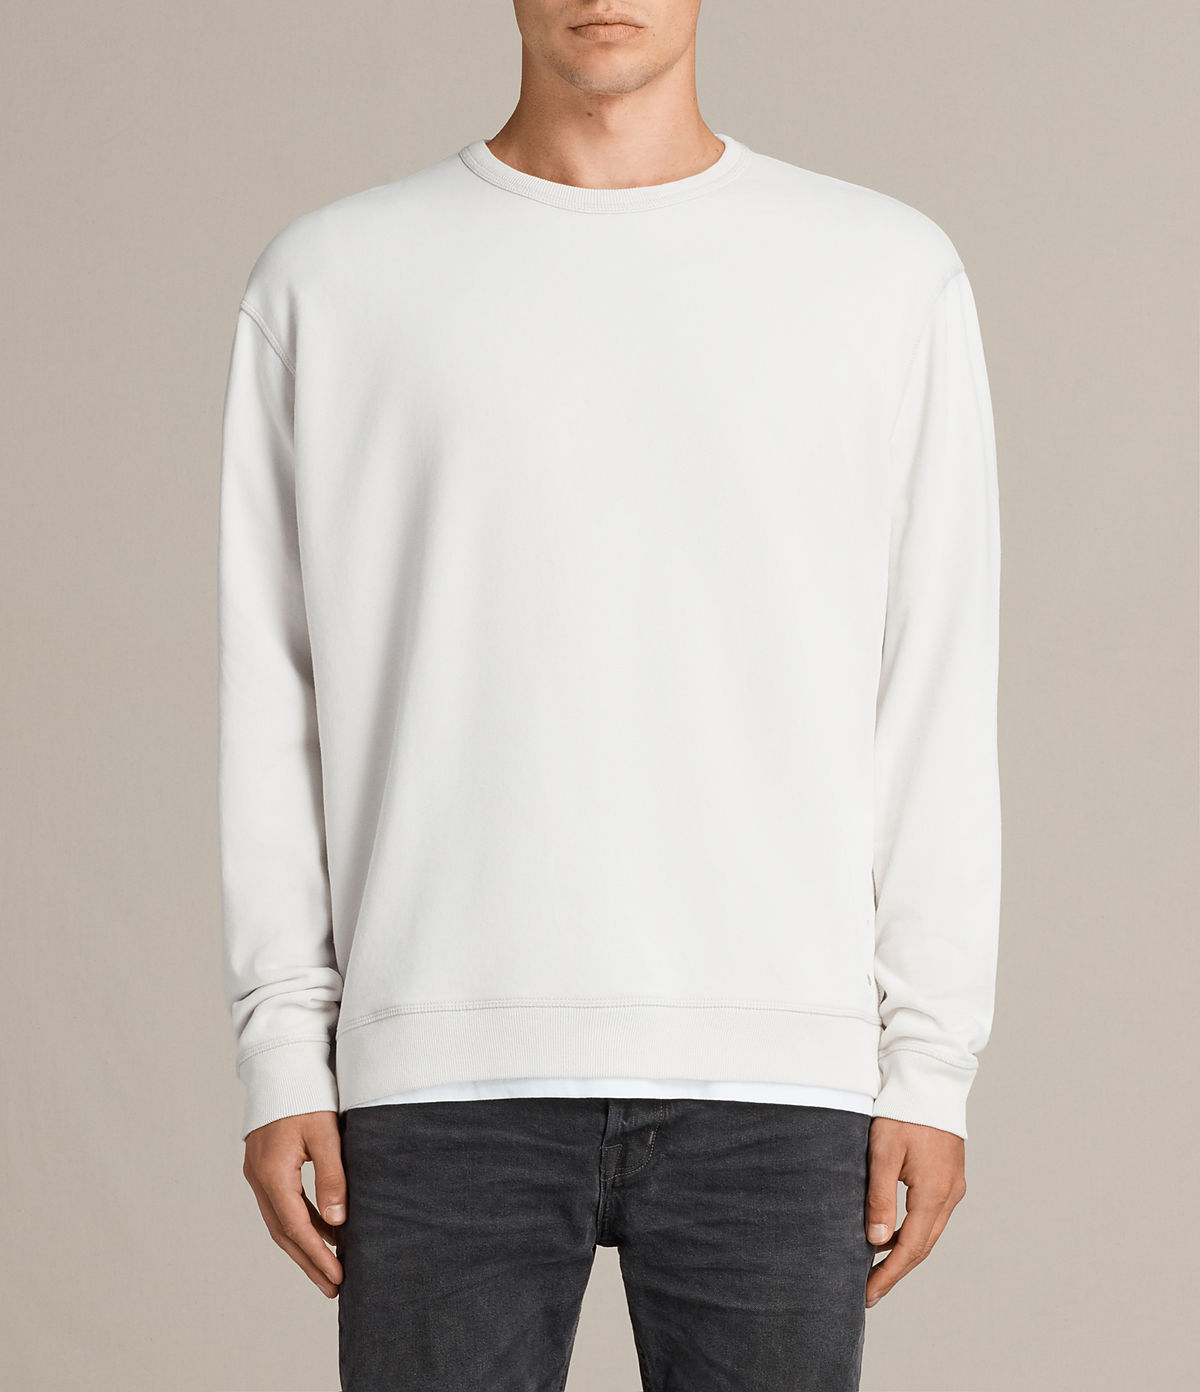 putro-crew-sweatshirt